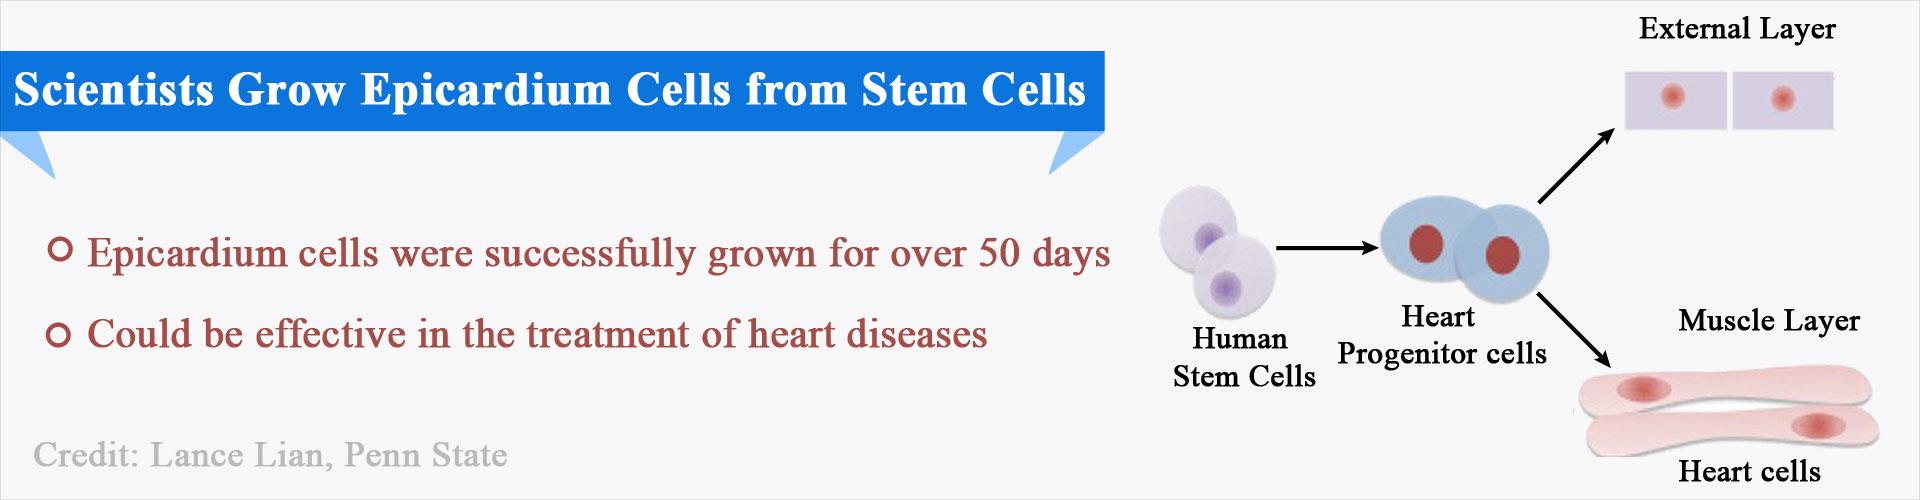 Epicardium Cells Grown From Stem Cells